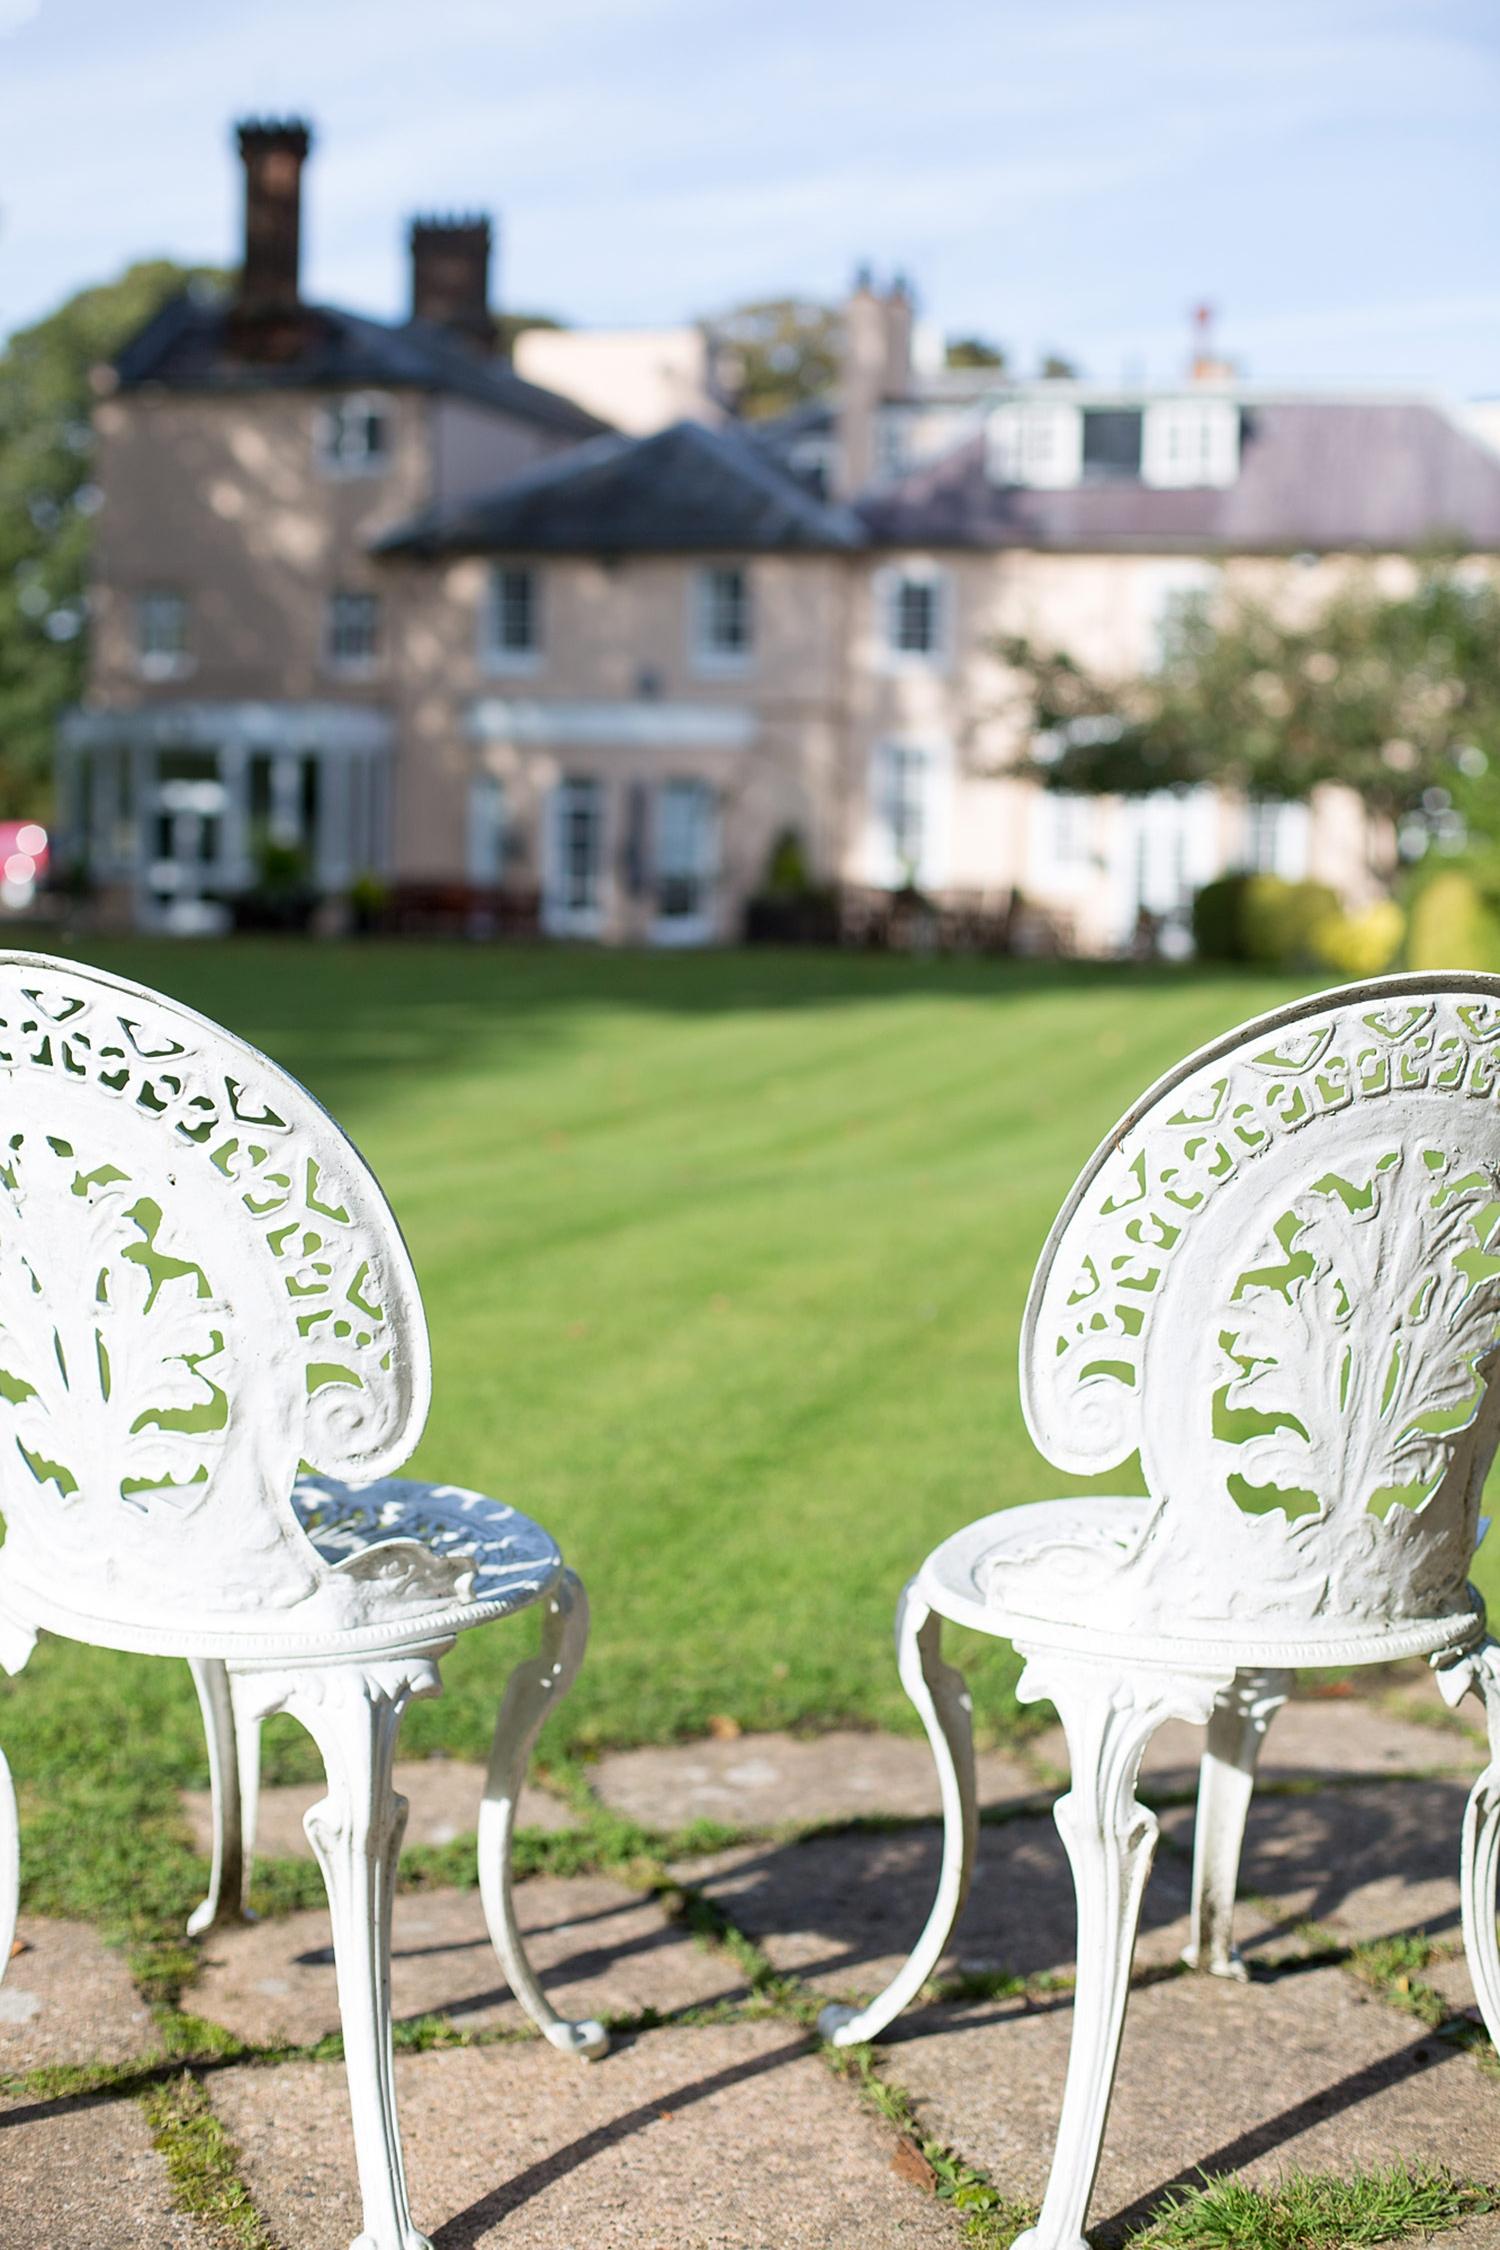 Holywell_Park_Nursing_Home_Sevenoaks_Exterior_016_.jpg